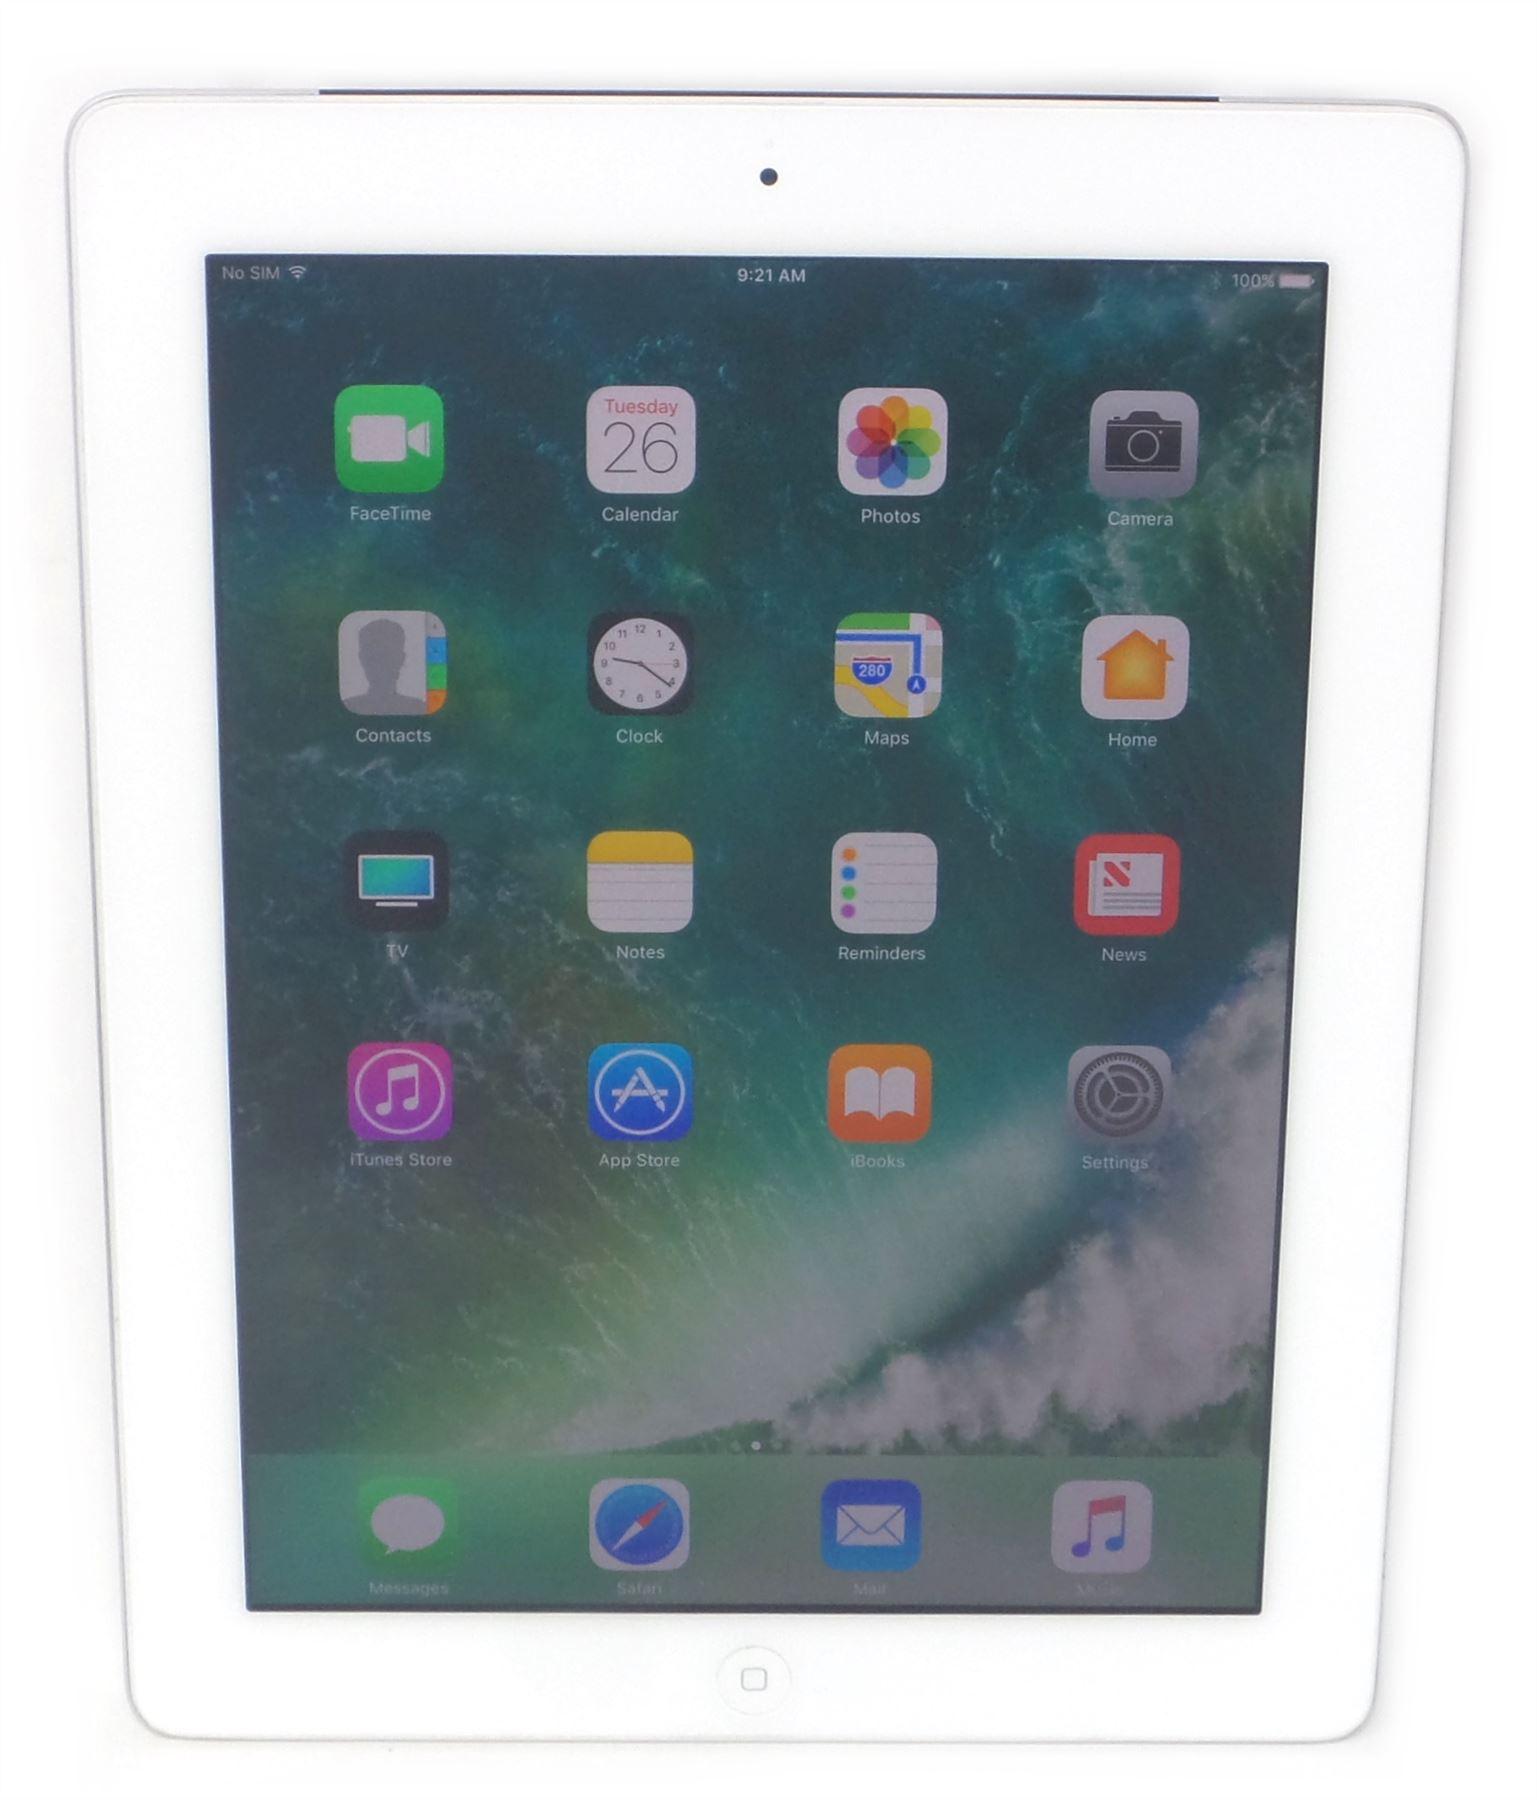 White Bare Apple iPad 4th Generation 9.7in 16GB Cellular Black 128GB Wi-Fi